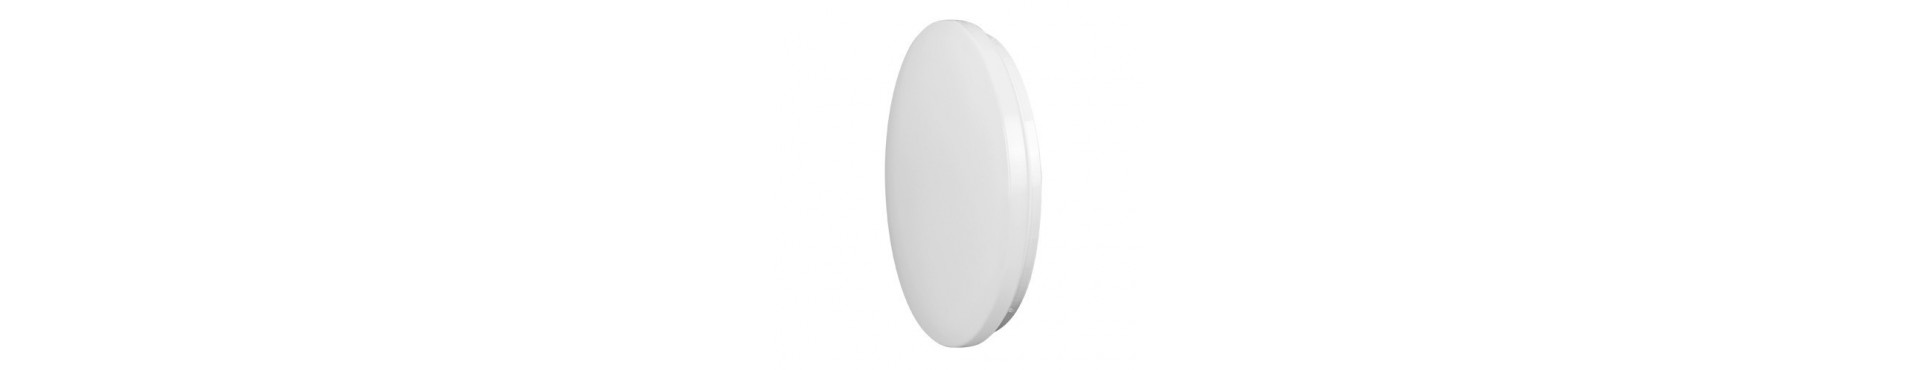 Runde loftlamper i LED - Se det store udvalg og bestil online her